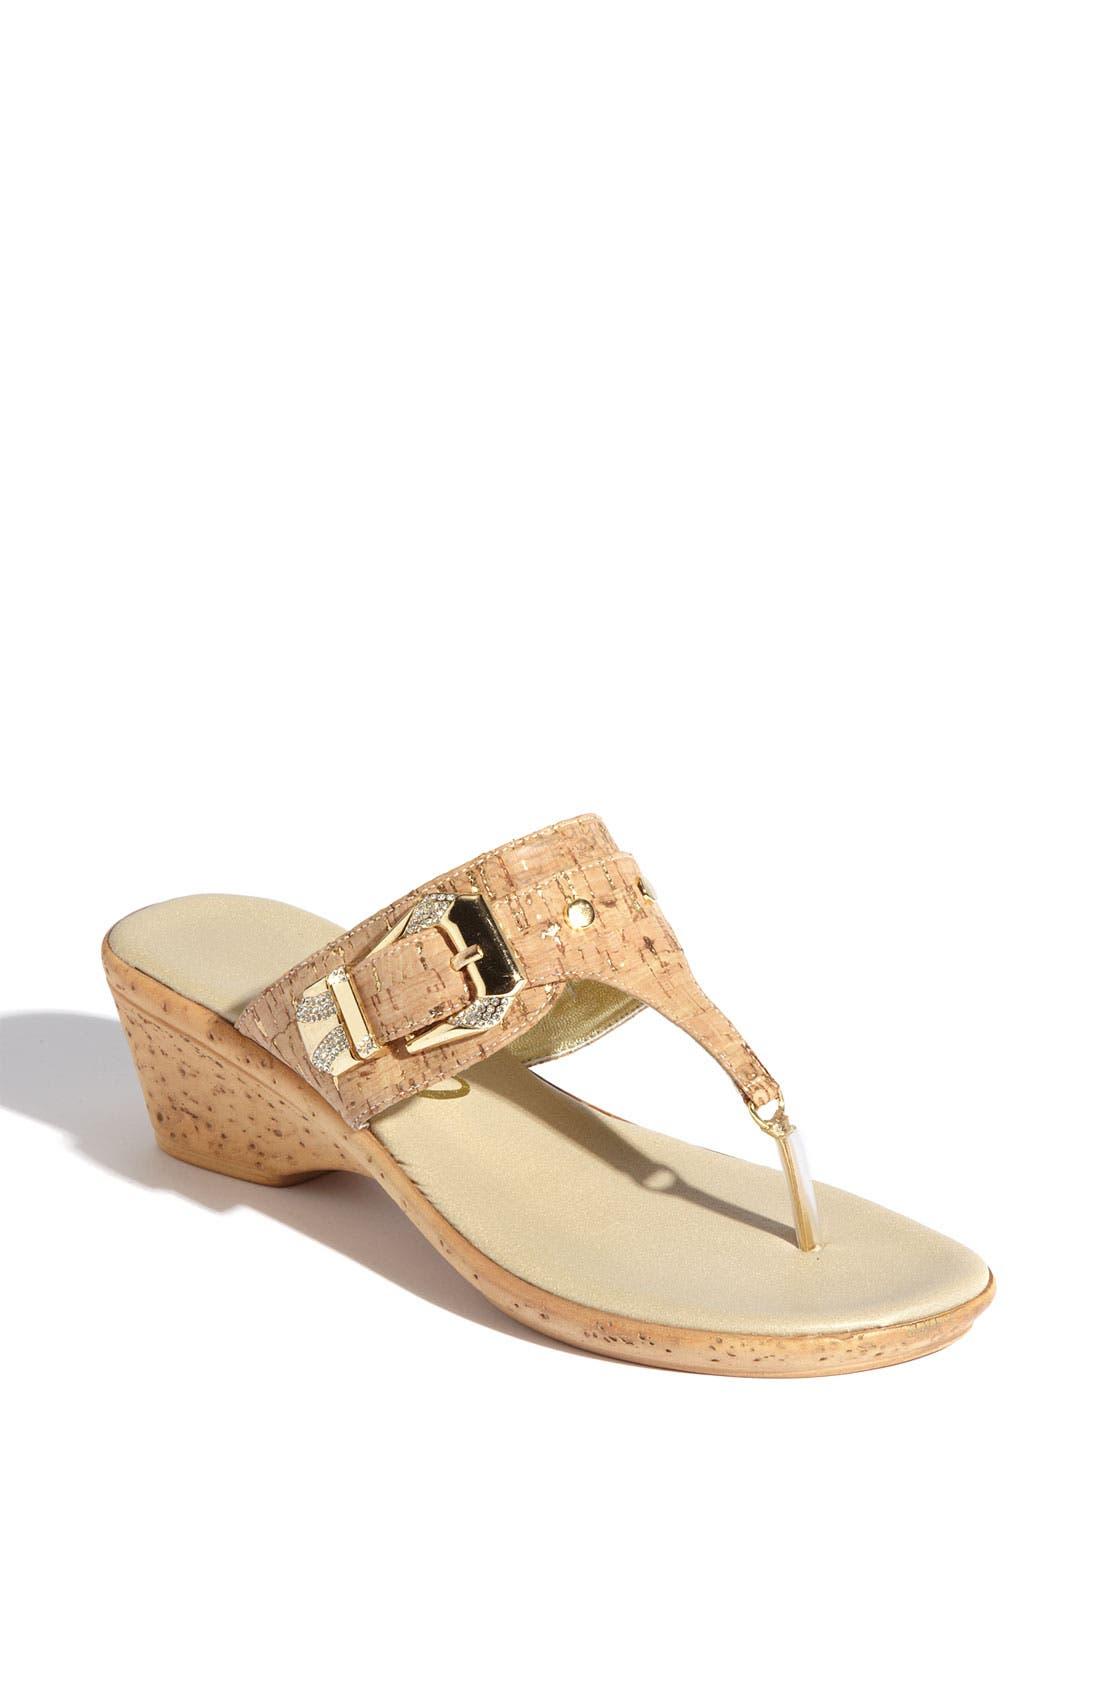 Main Image - Onex 'Texas' Sandal